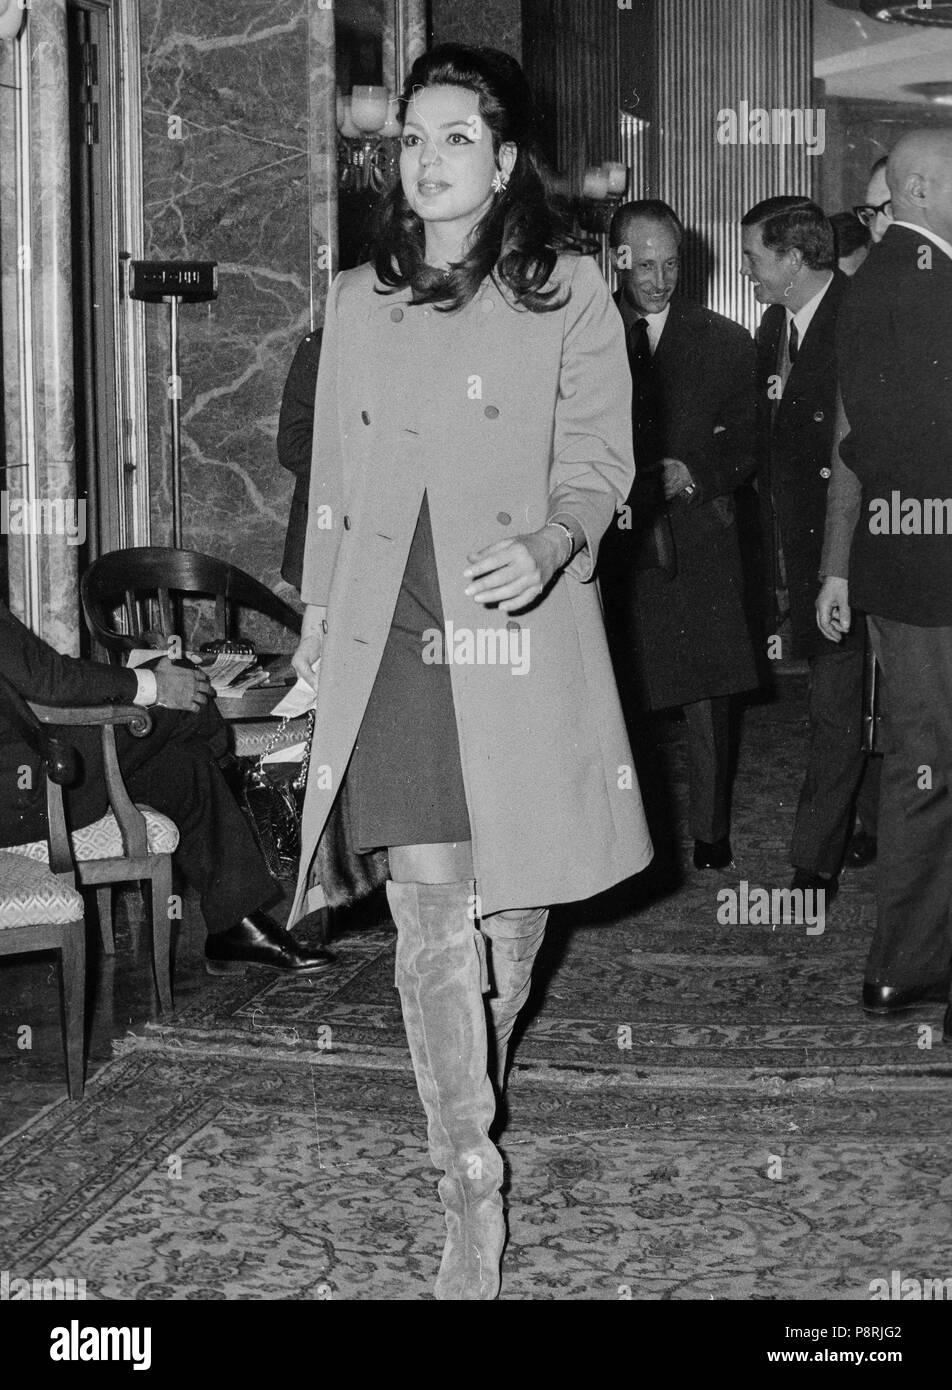 ira von furstenberg, milan 1967 - Stock Image